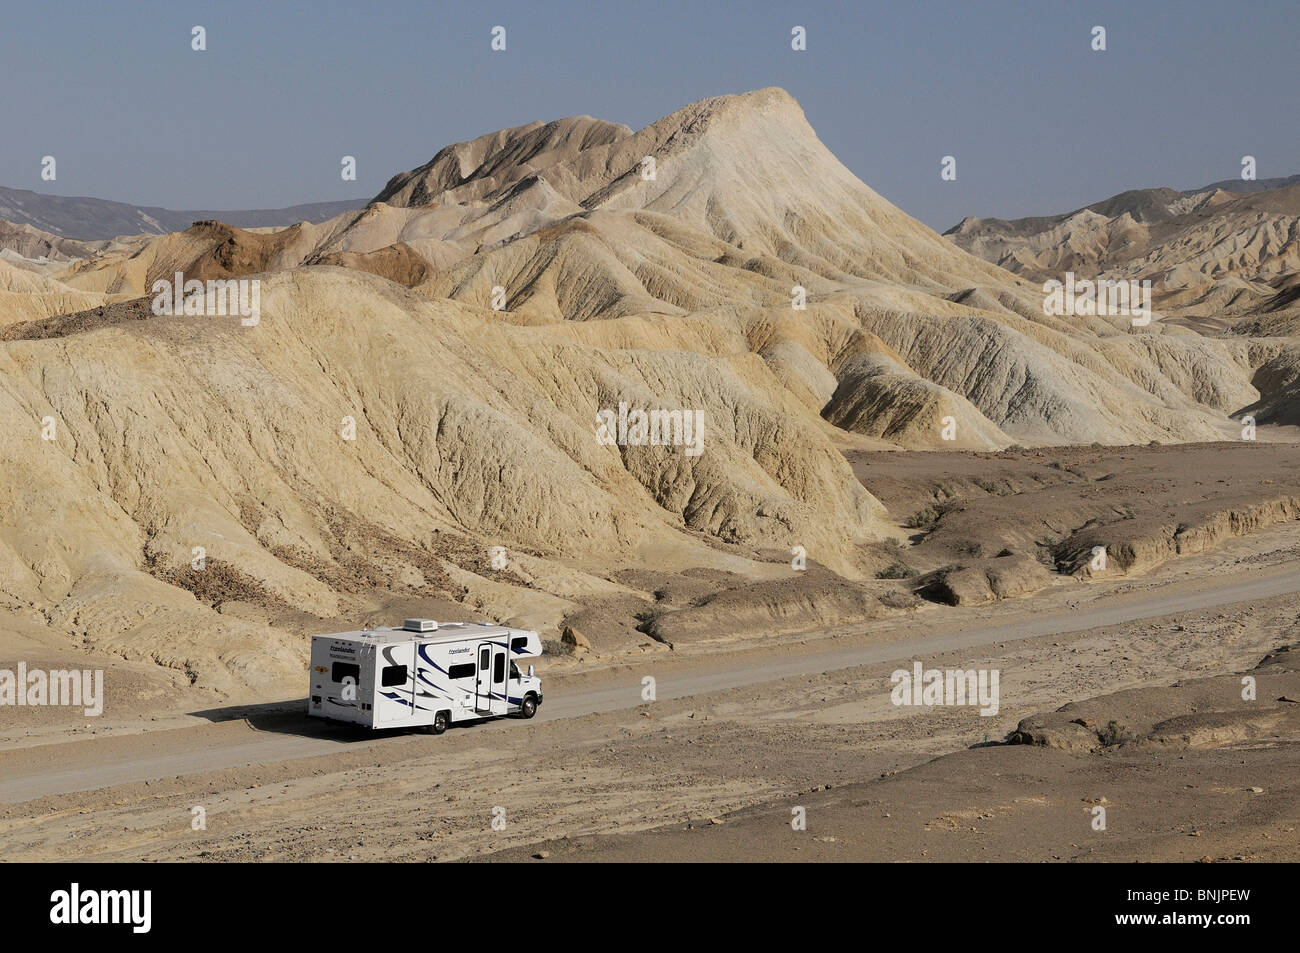 Roadbear RV Camper caravan 20 Mule Team Canyon Death Valley National Park California USA America North America travel - Stock Image